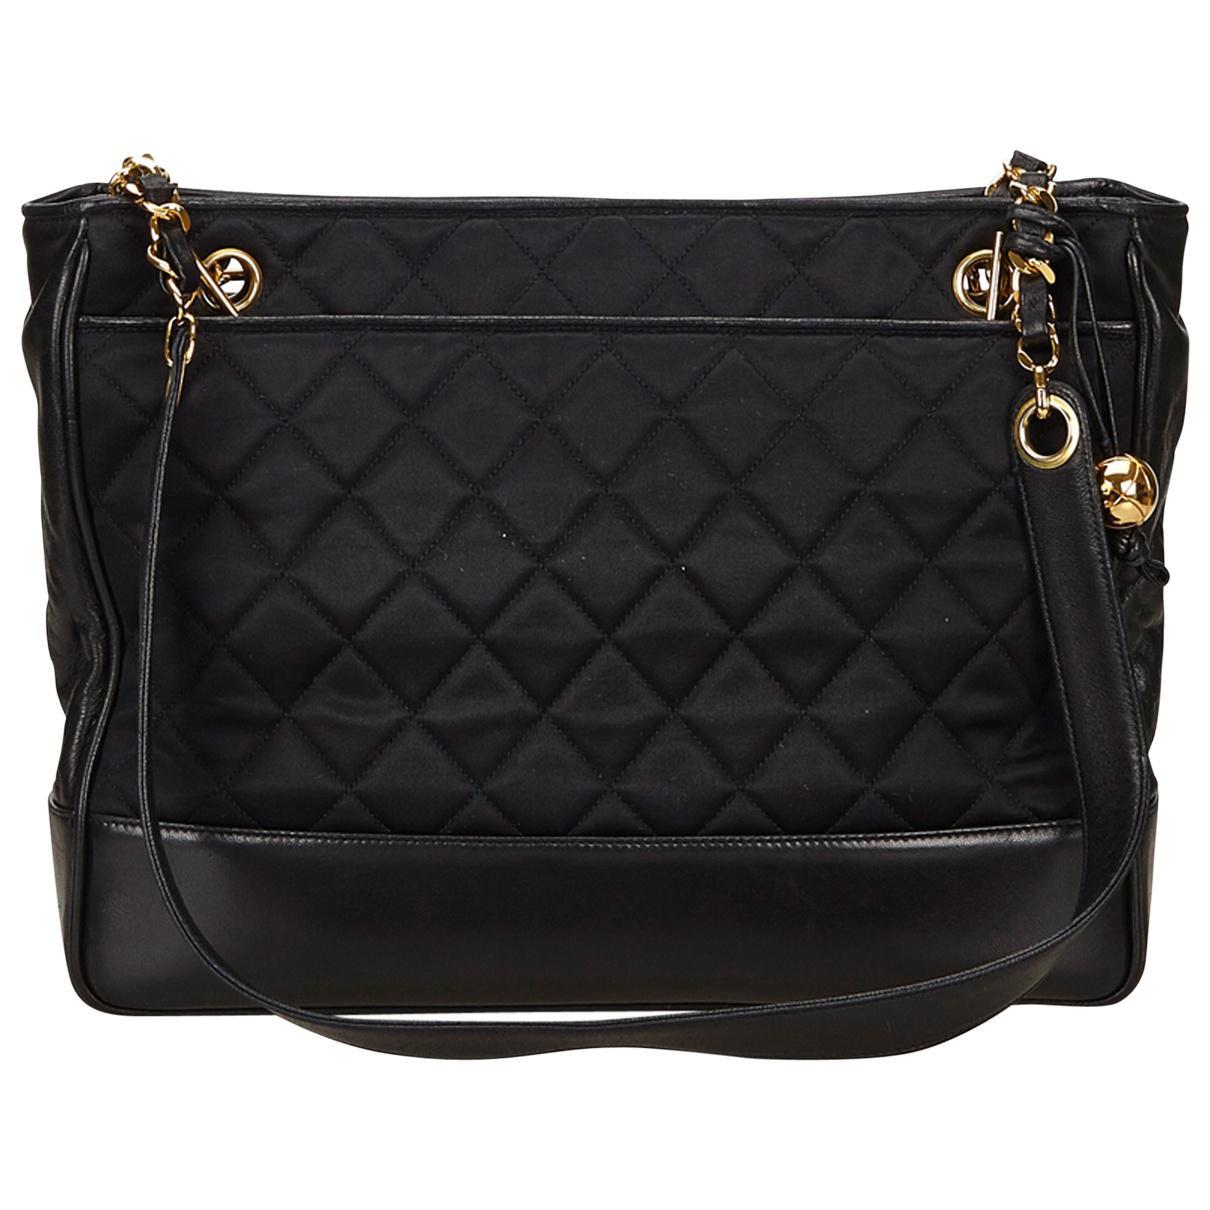 Chanel Pre-owned - Cloth handbag gdql7h